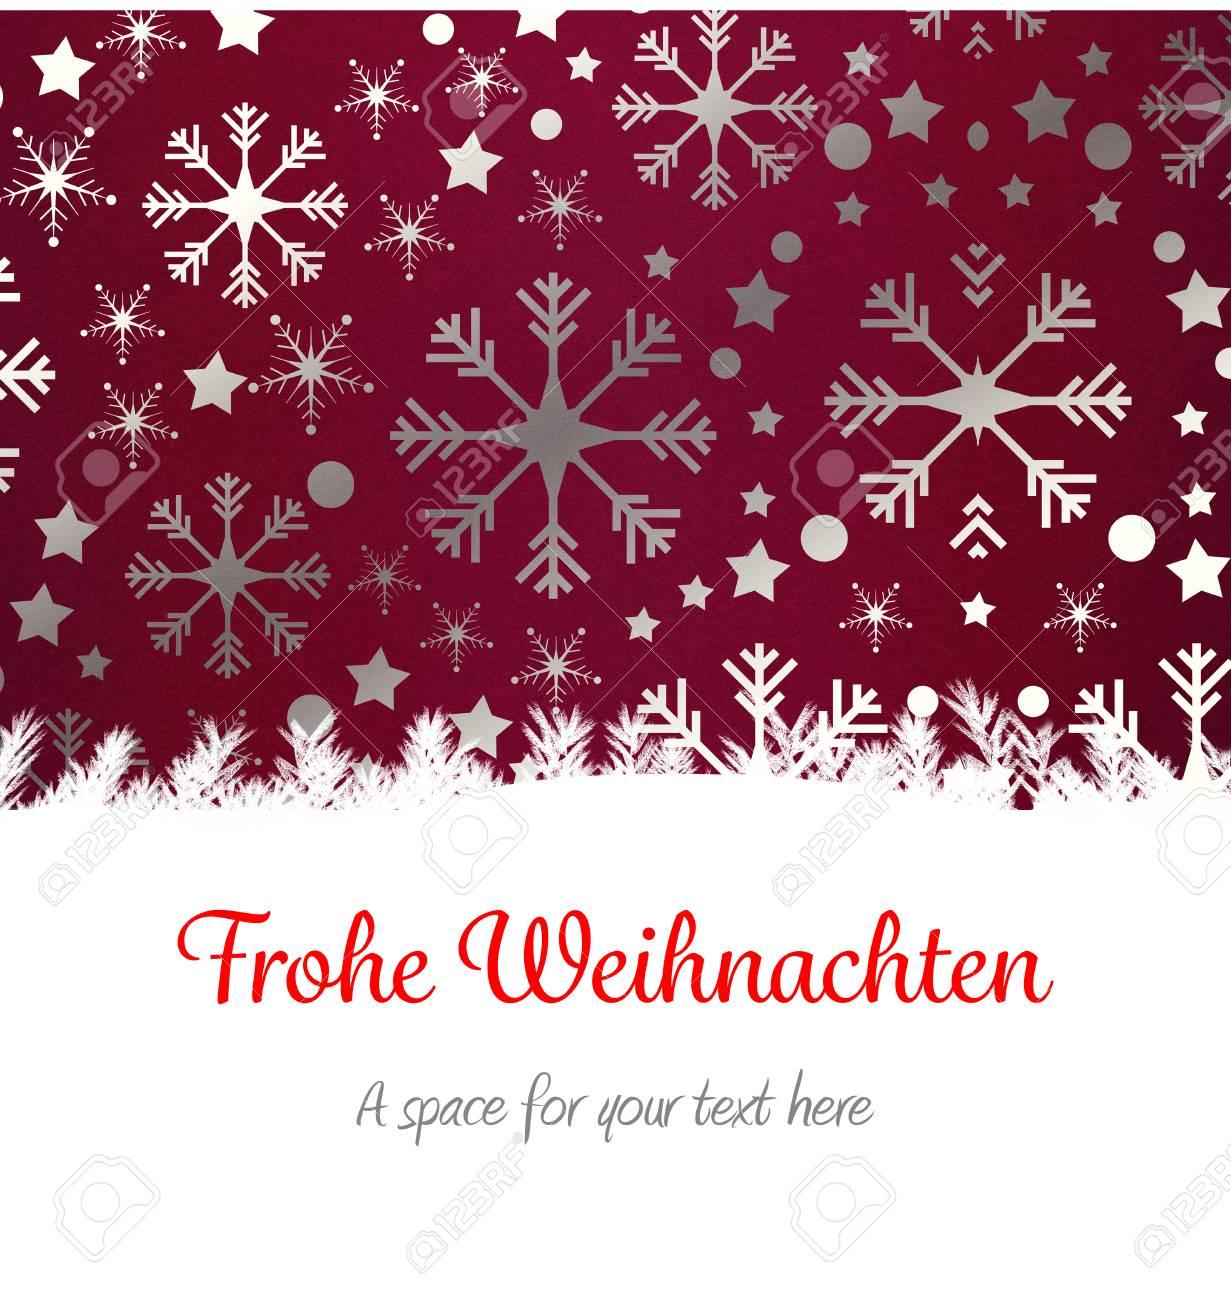 Christmas greeting in german against snowflake wallpaper pattern christmas greeting in german against snowflake wallpaper pattern stock photo 42642518 m4hsunfo